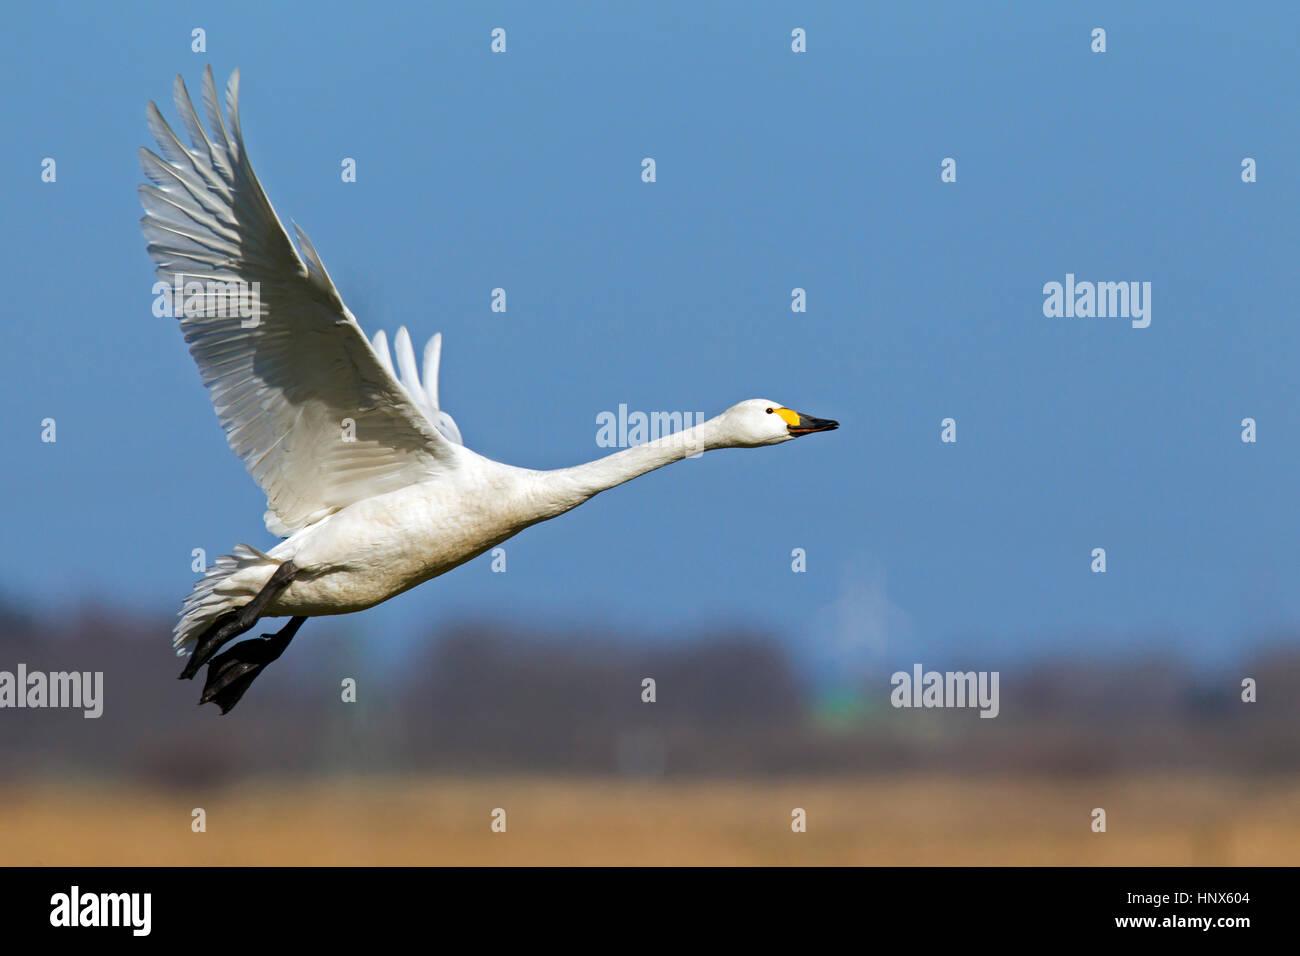 Tundra swan (Cygnus columbianus) / Bewick's swan (Cygnus bewickii) taking off in spring - Stock Image